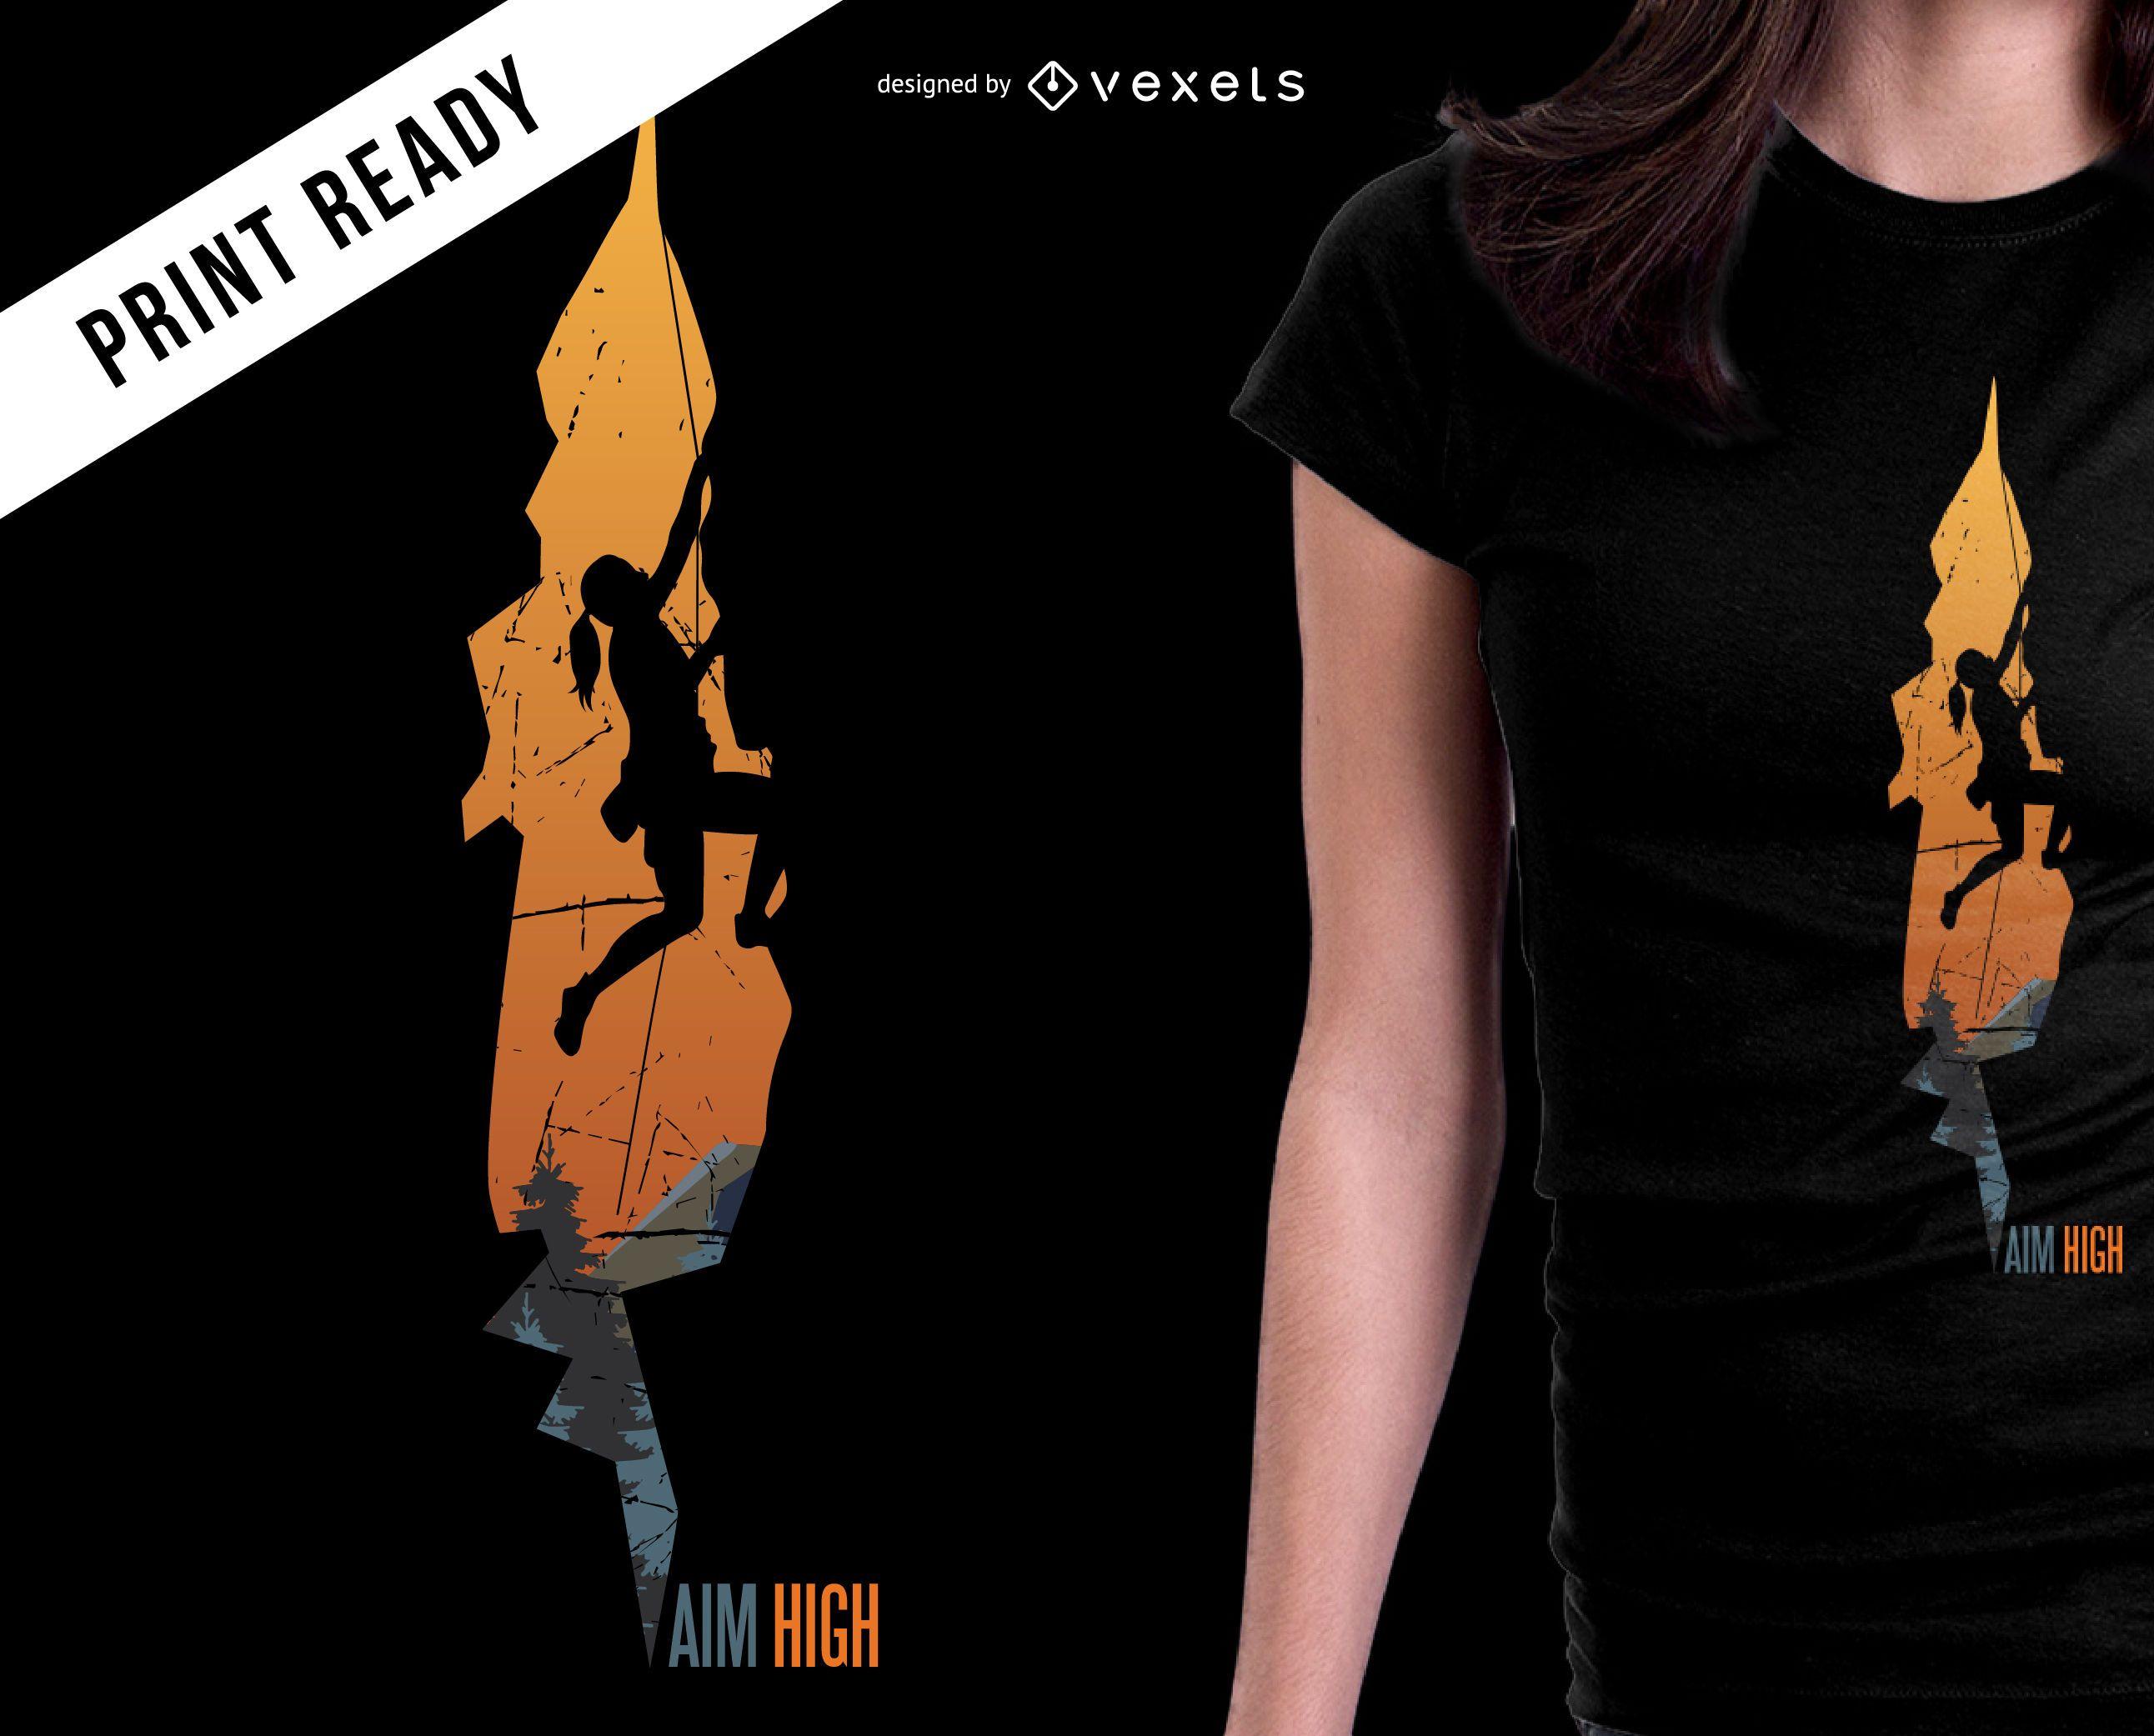 Diseño de camiseta de objetivo de alta montaña.